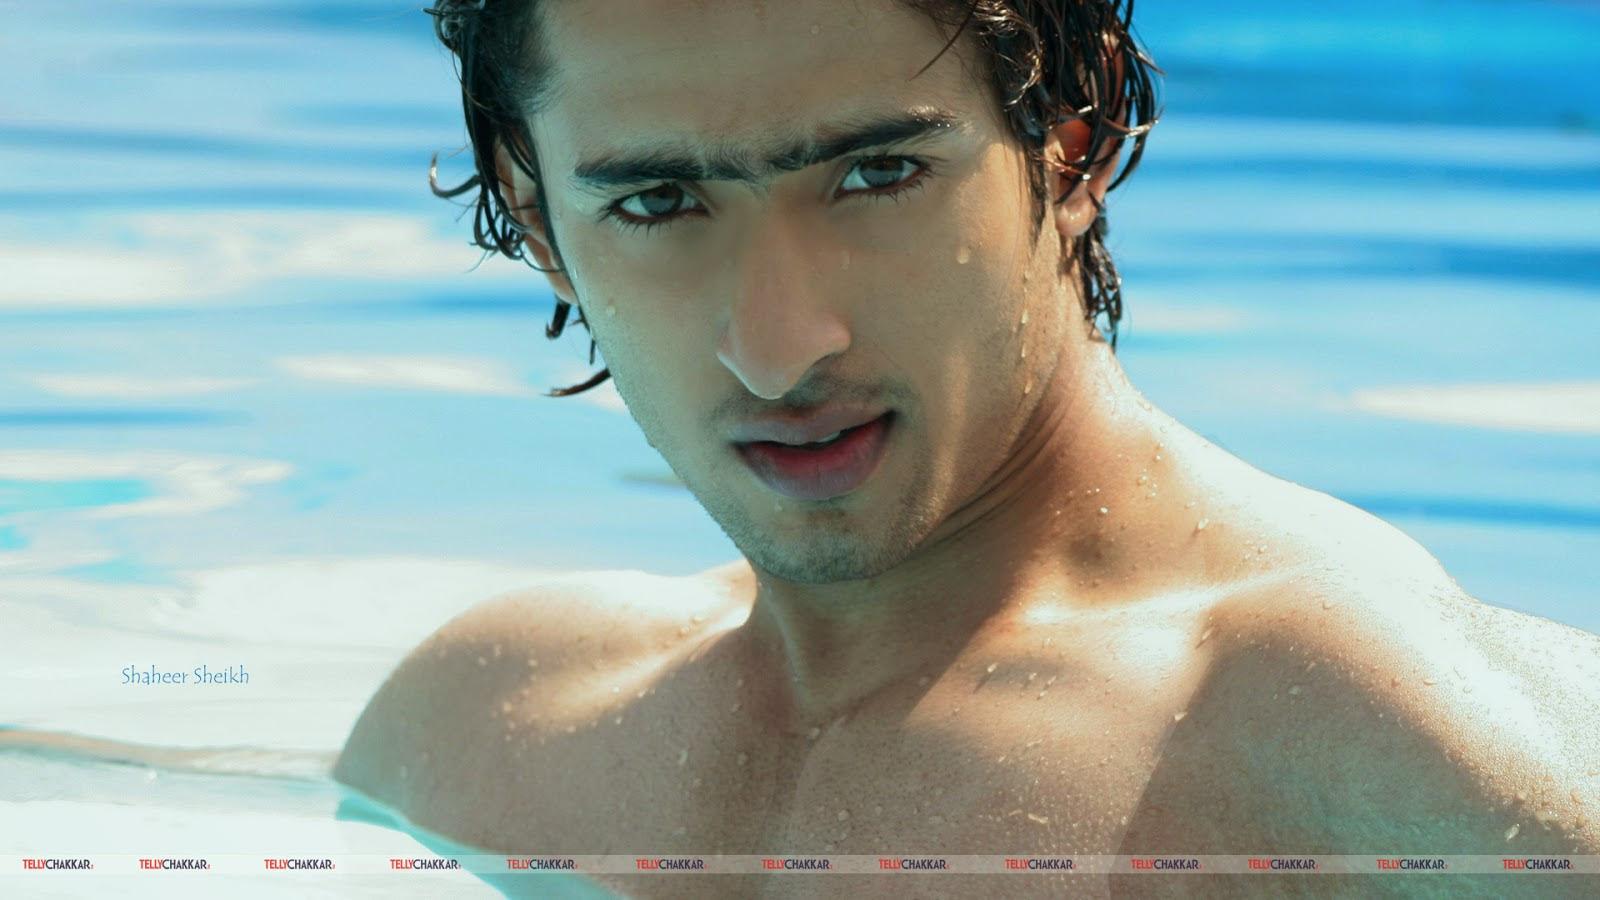 Foto Hot Shaheer Sheikh Pemeran Arjuna